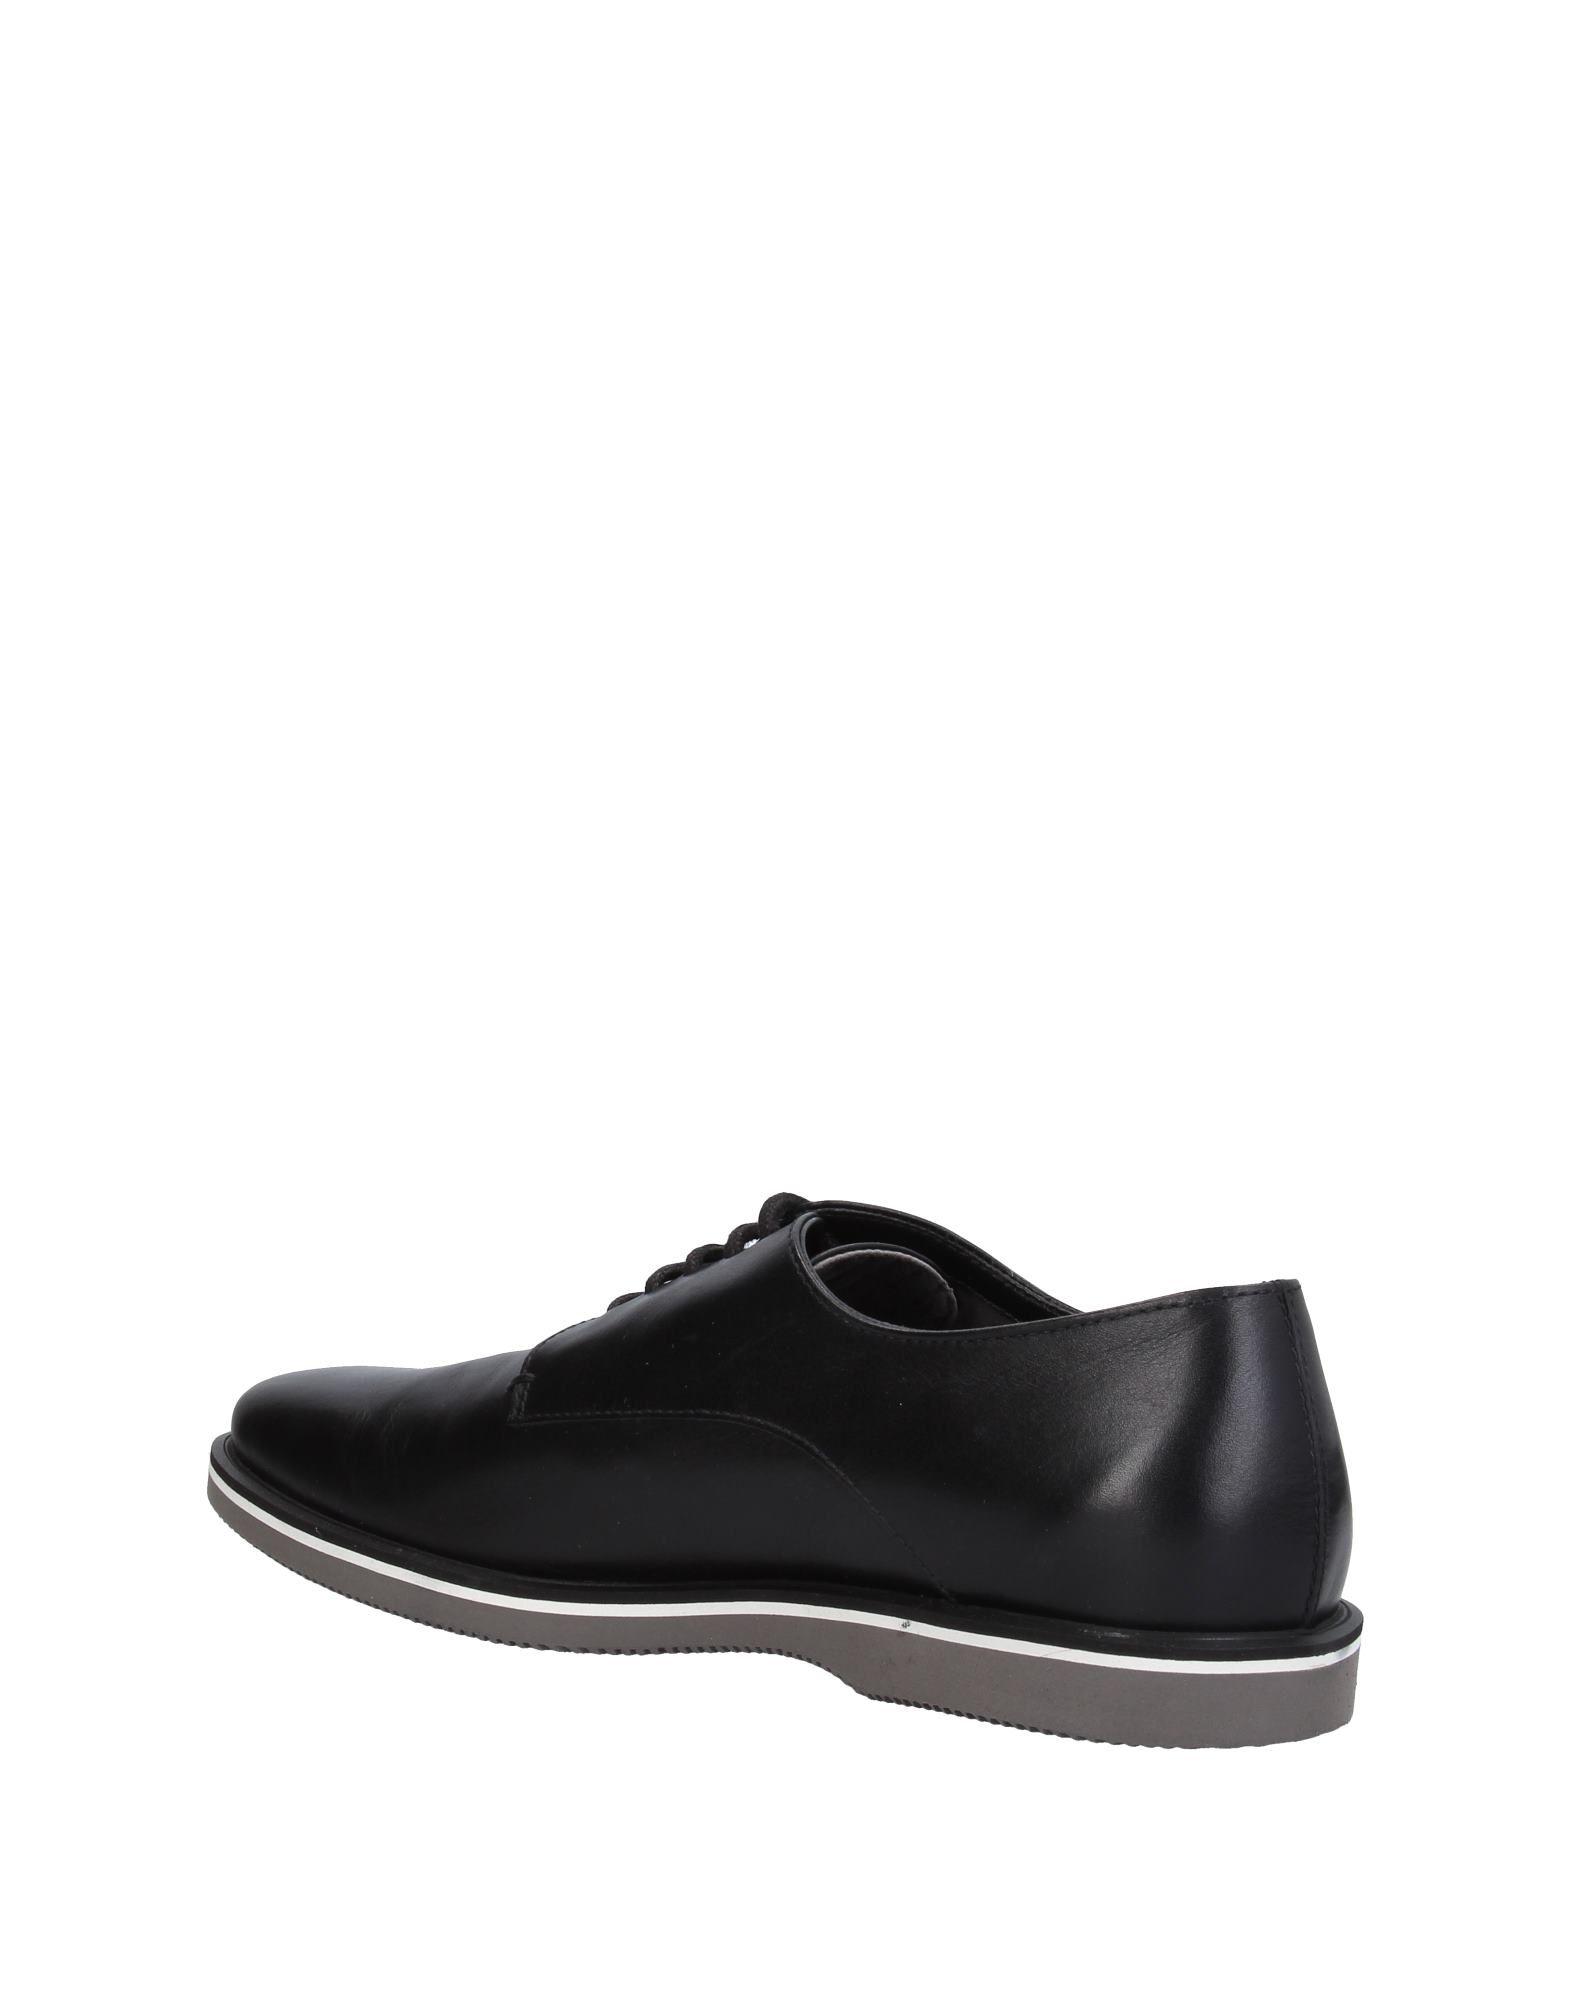 Chaussures - Tribunaux Lerre mTIZI